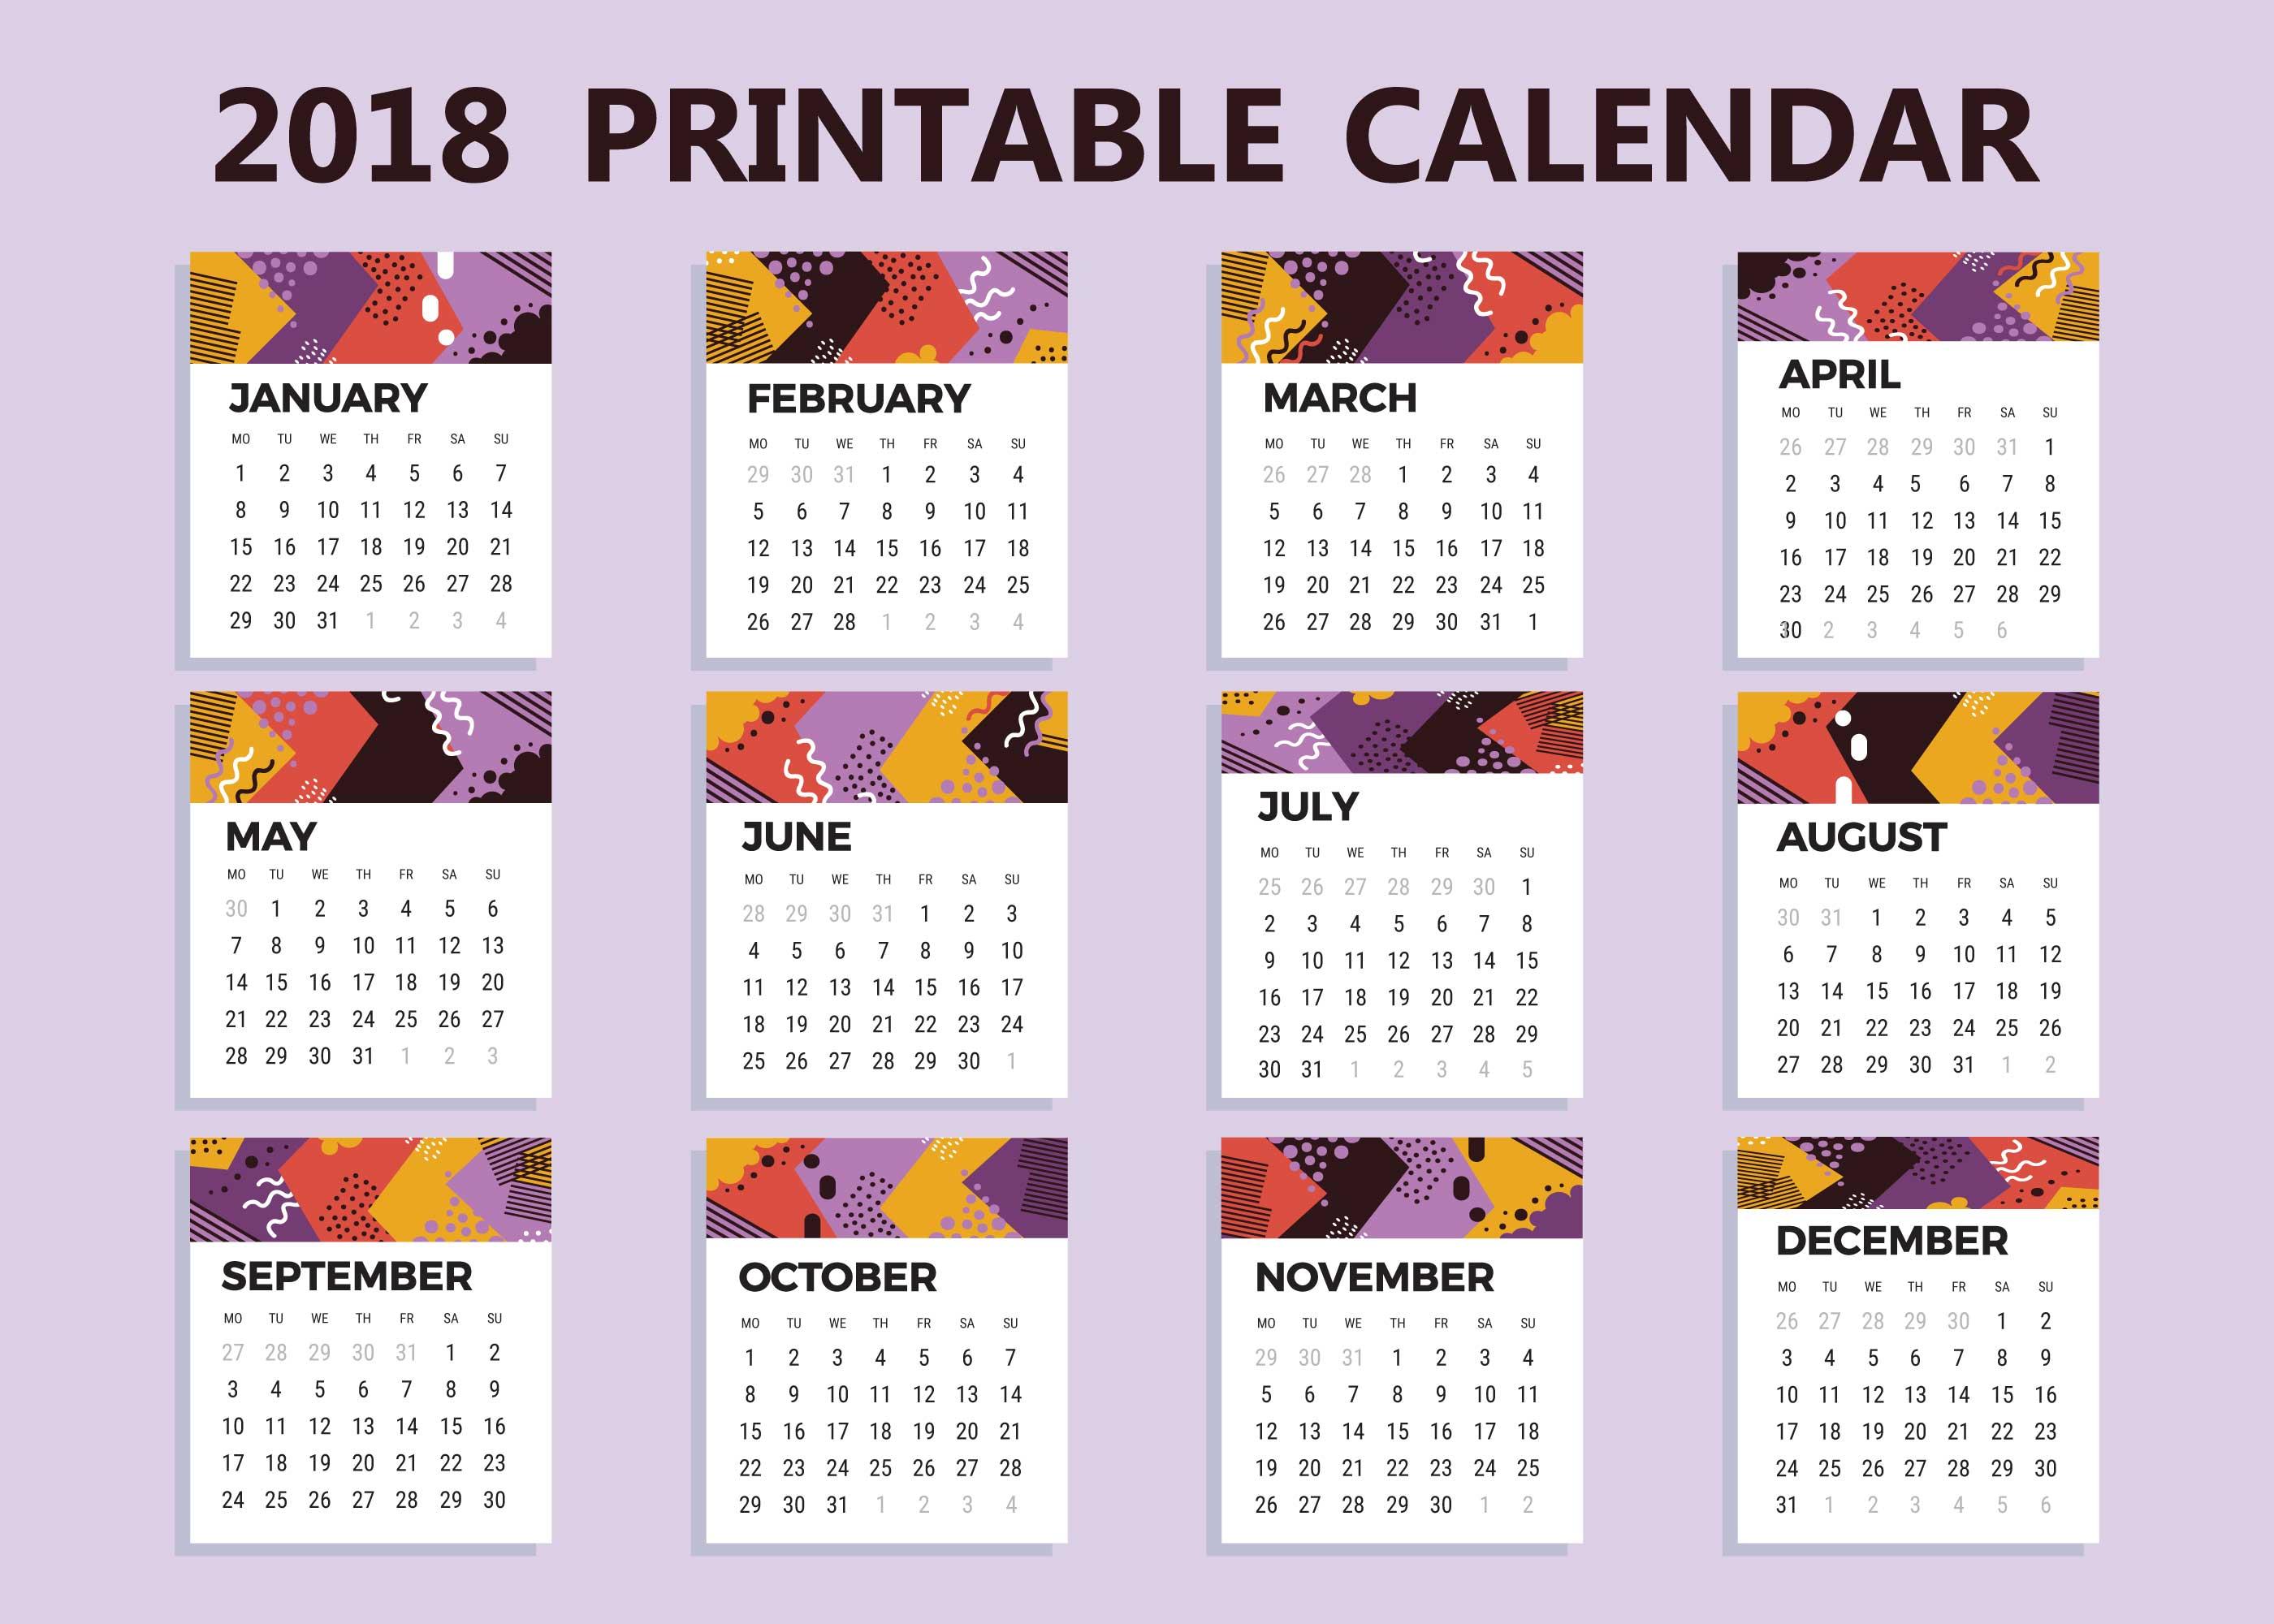 Free 2018 Printable Calendar Vector - Download Free Vector Art, Stock Graphics & Images